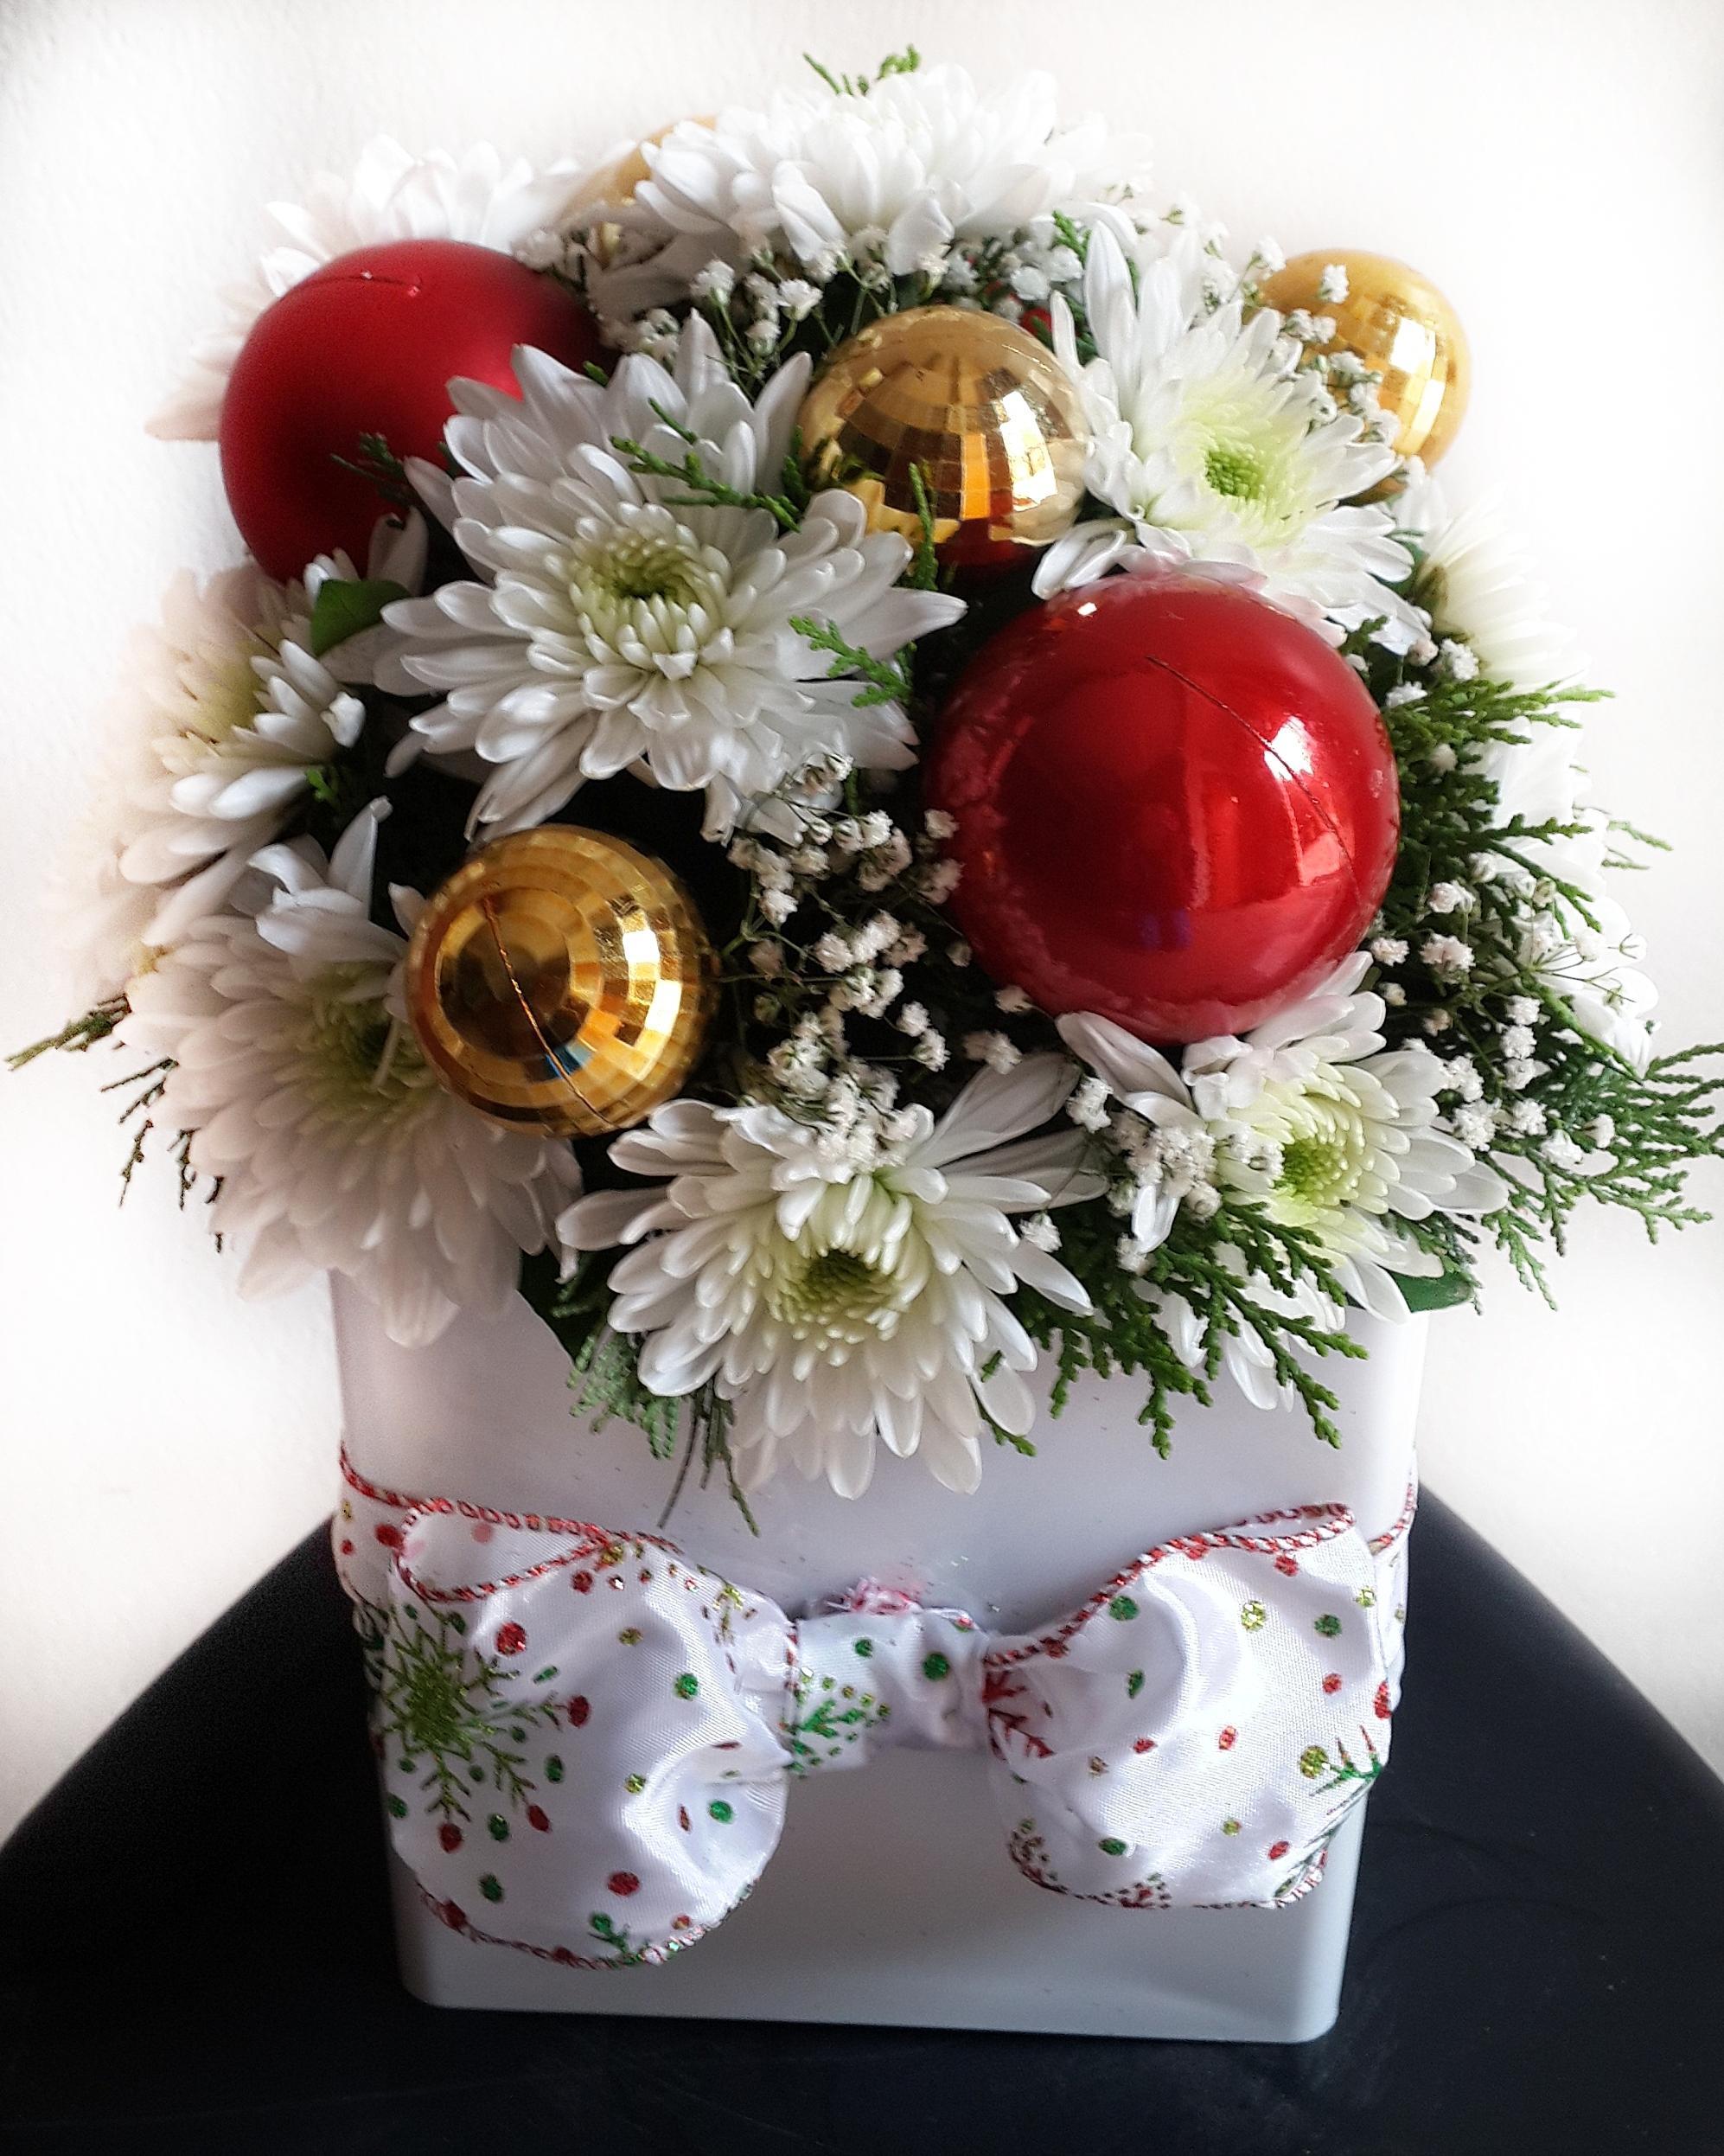 Flowers & Christmas Flower Arrangement with Baubles